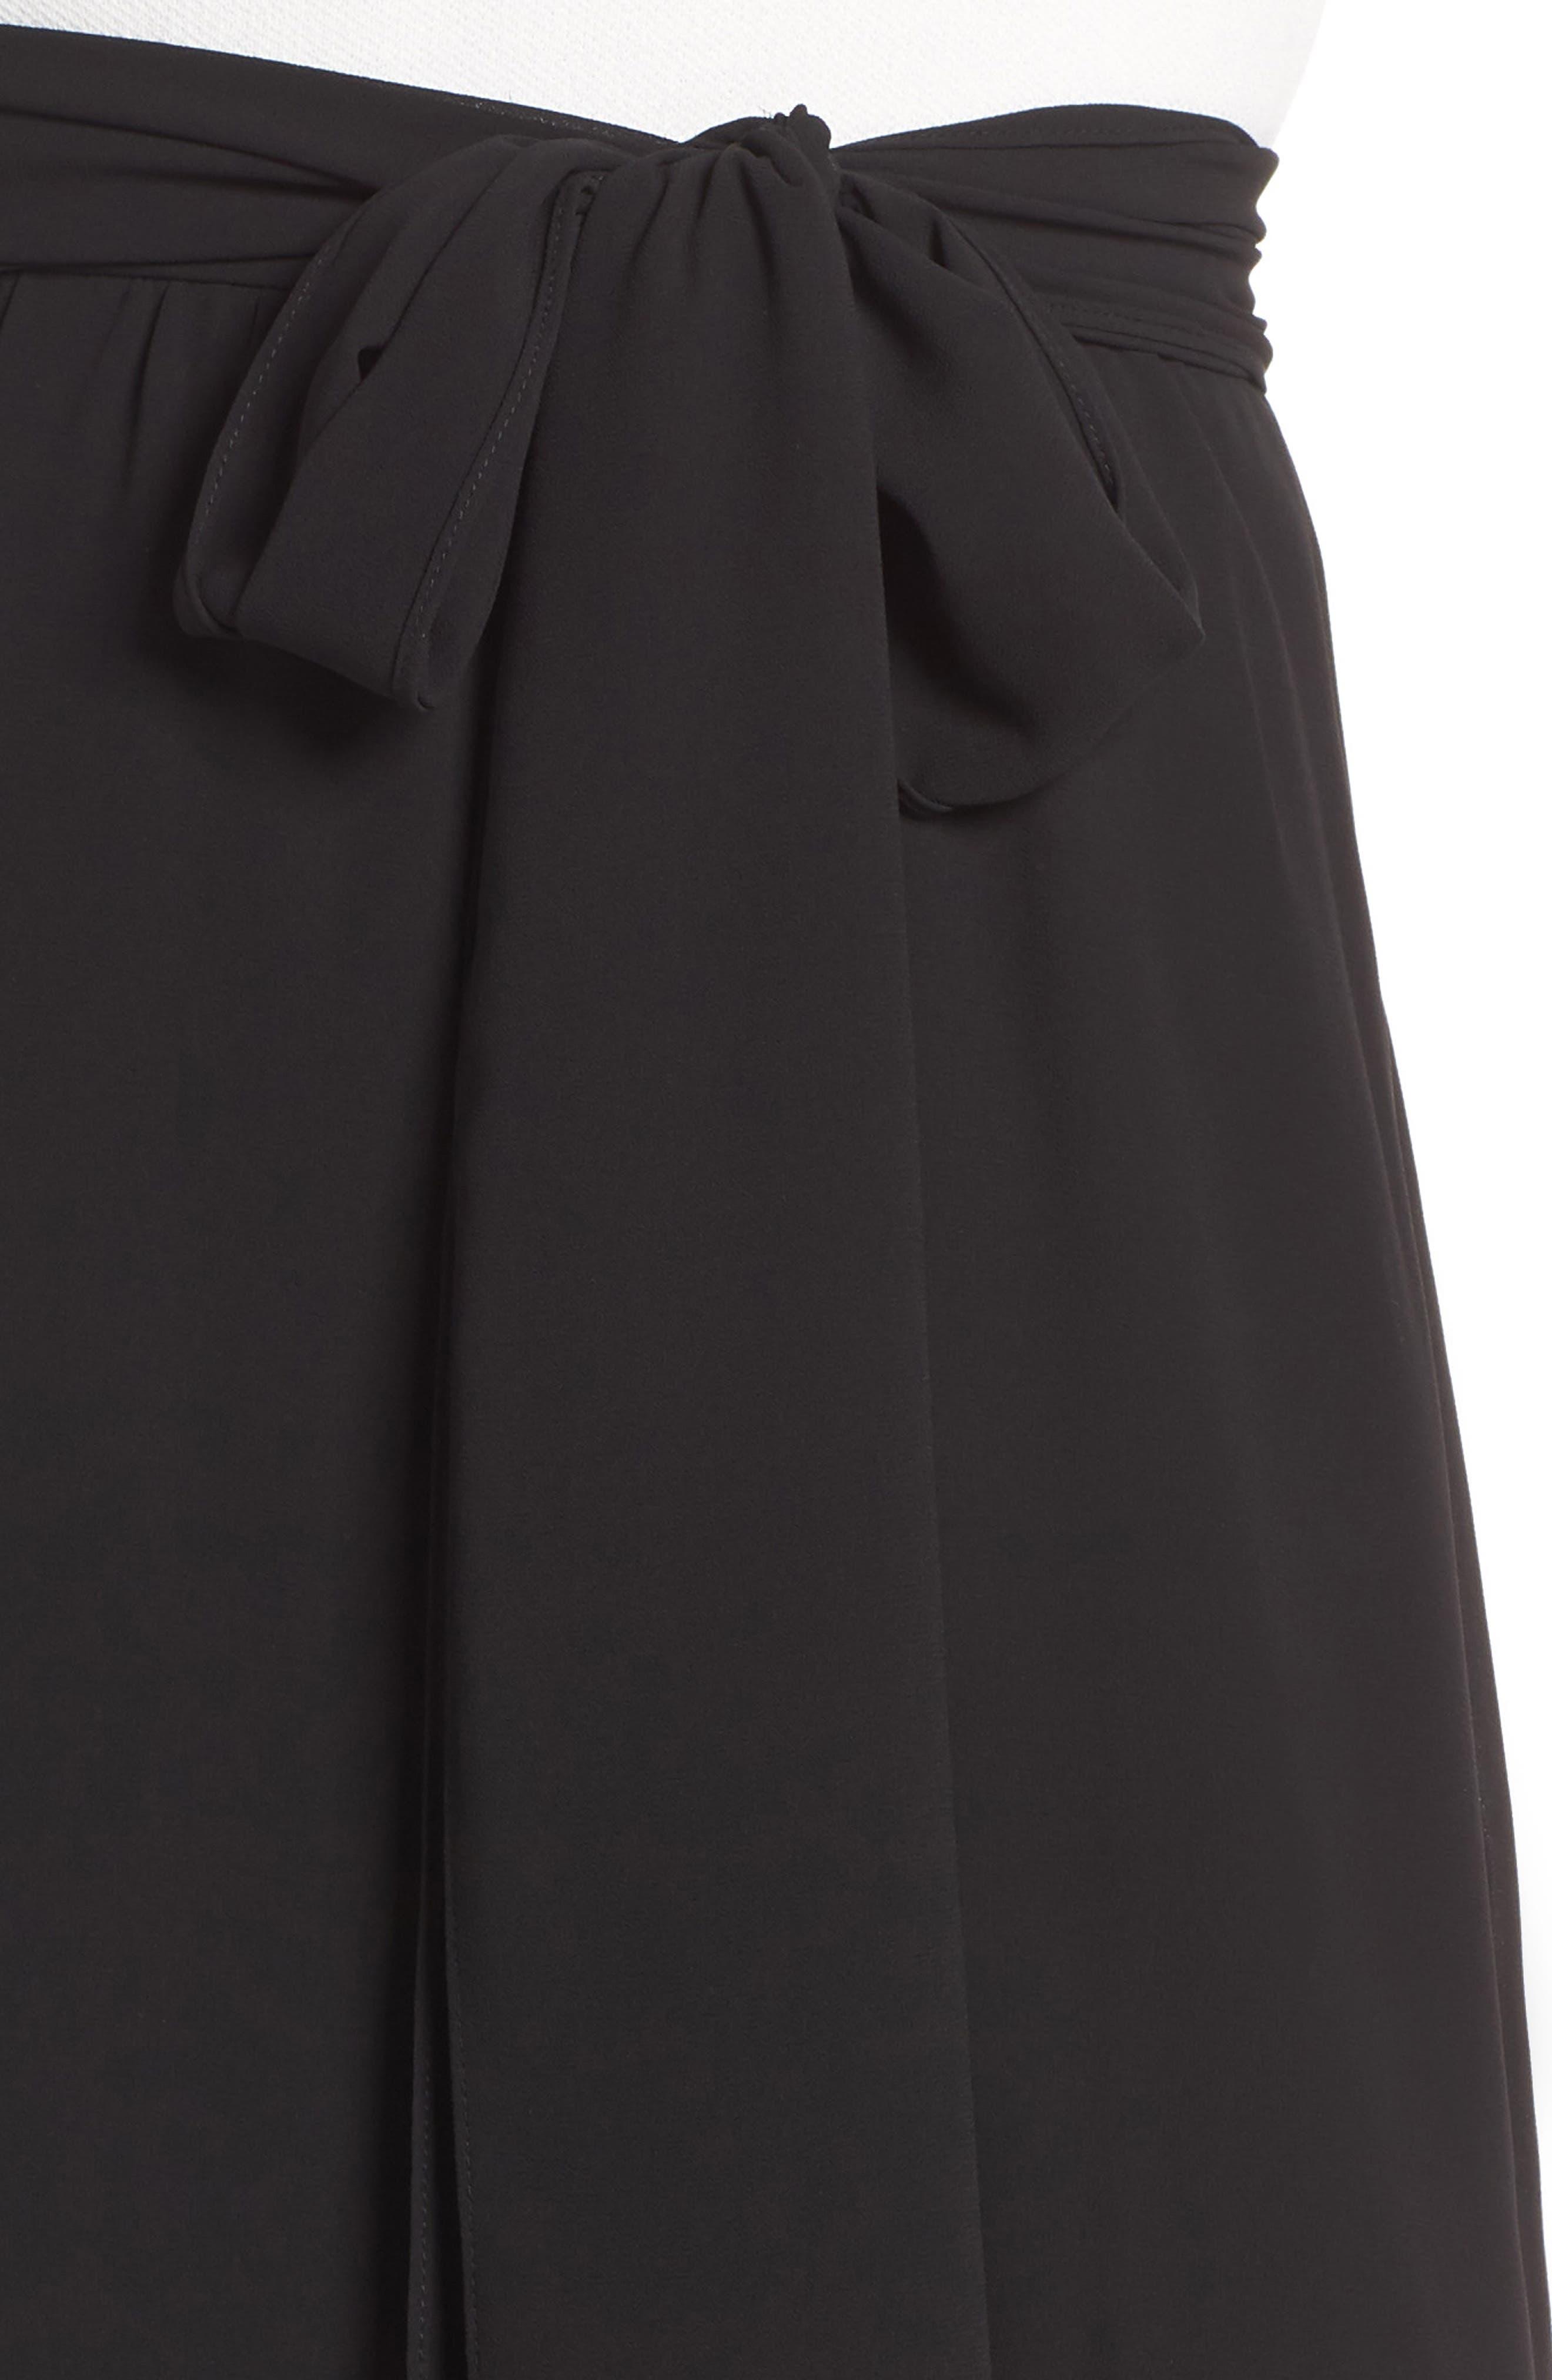 Asymmetrical High/Low Flounce Skirt,                             Alternate thumbnail 4, color,                             001